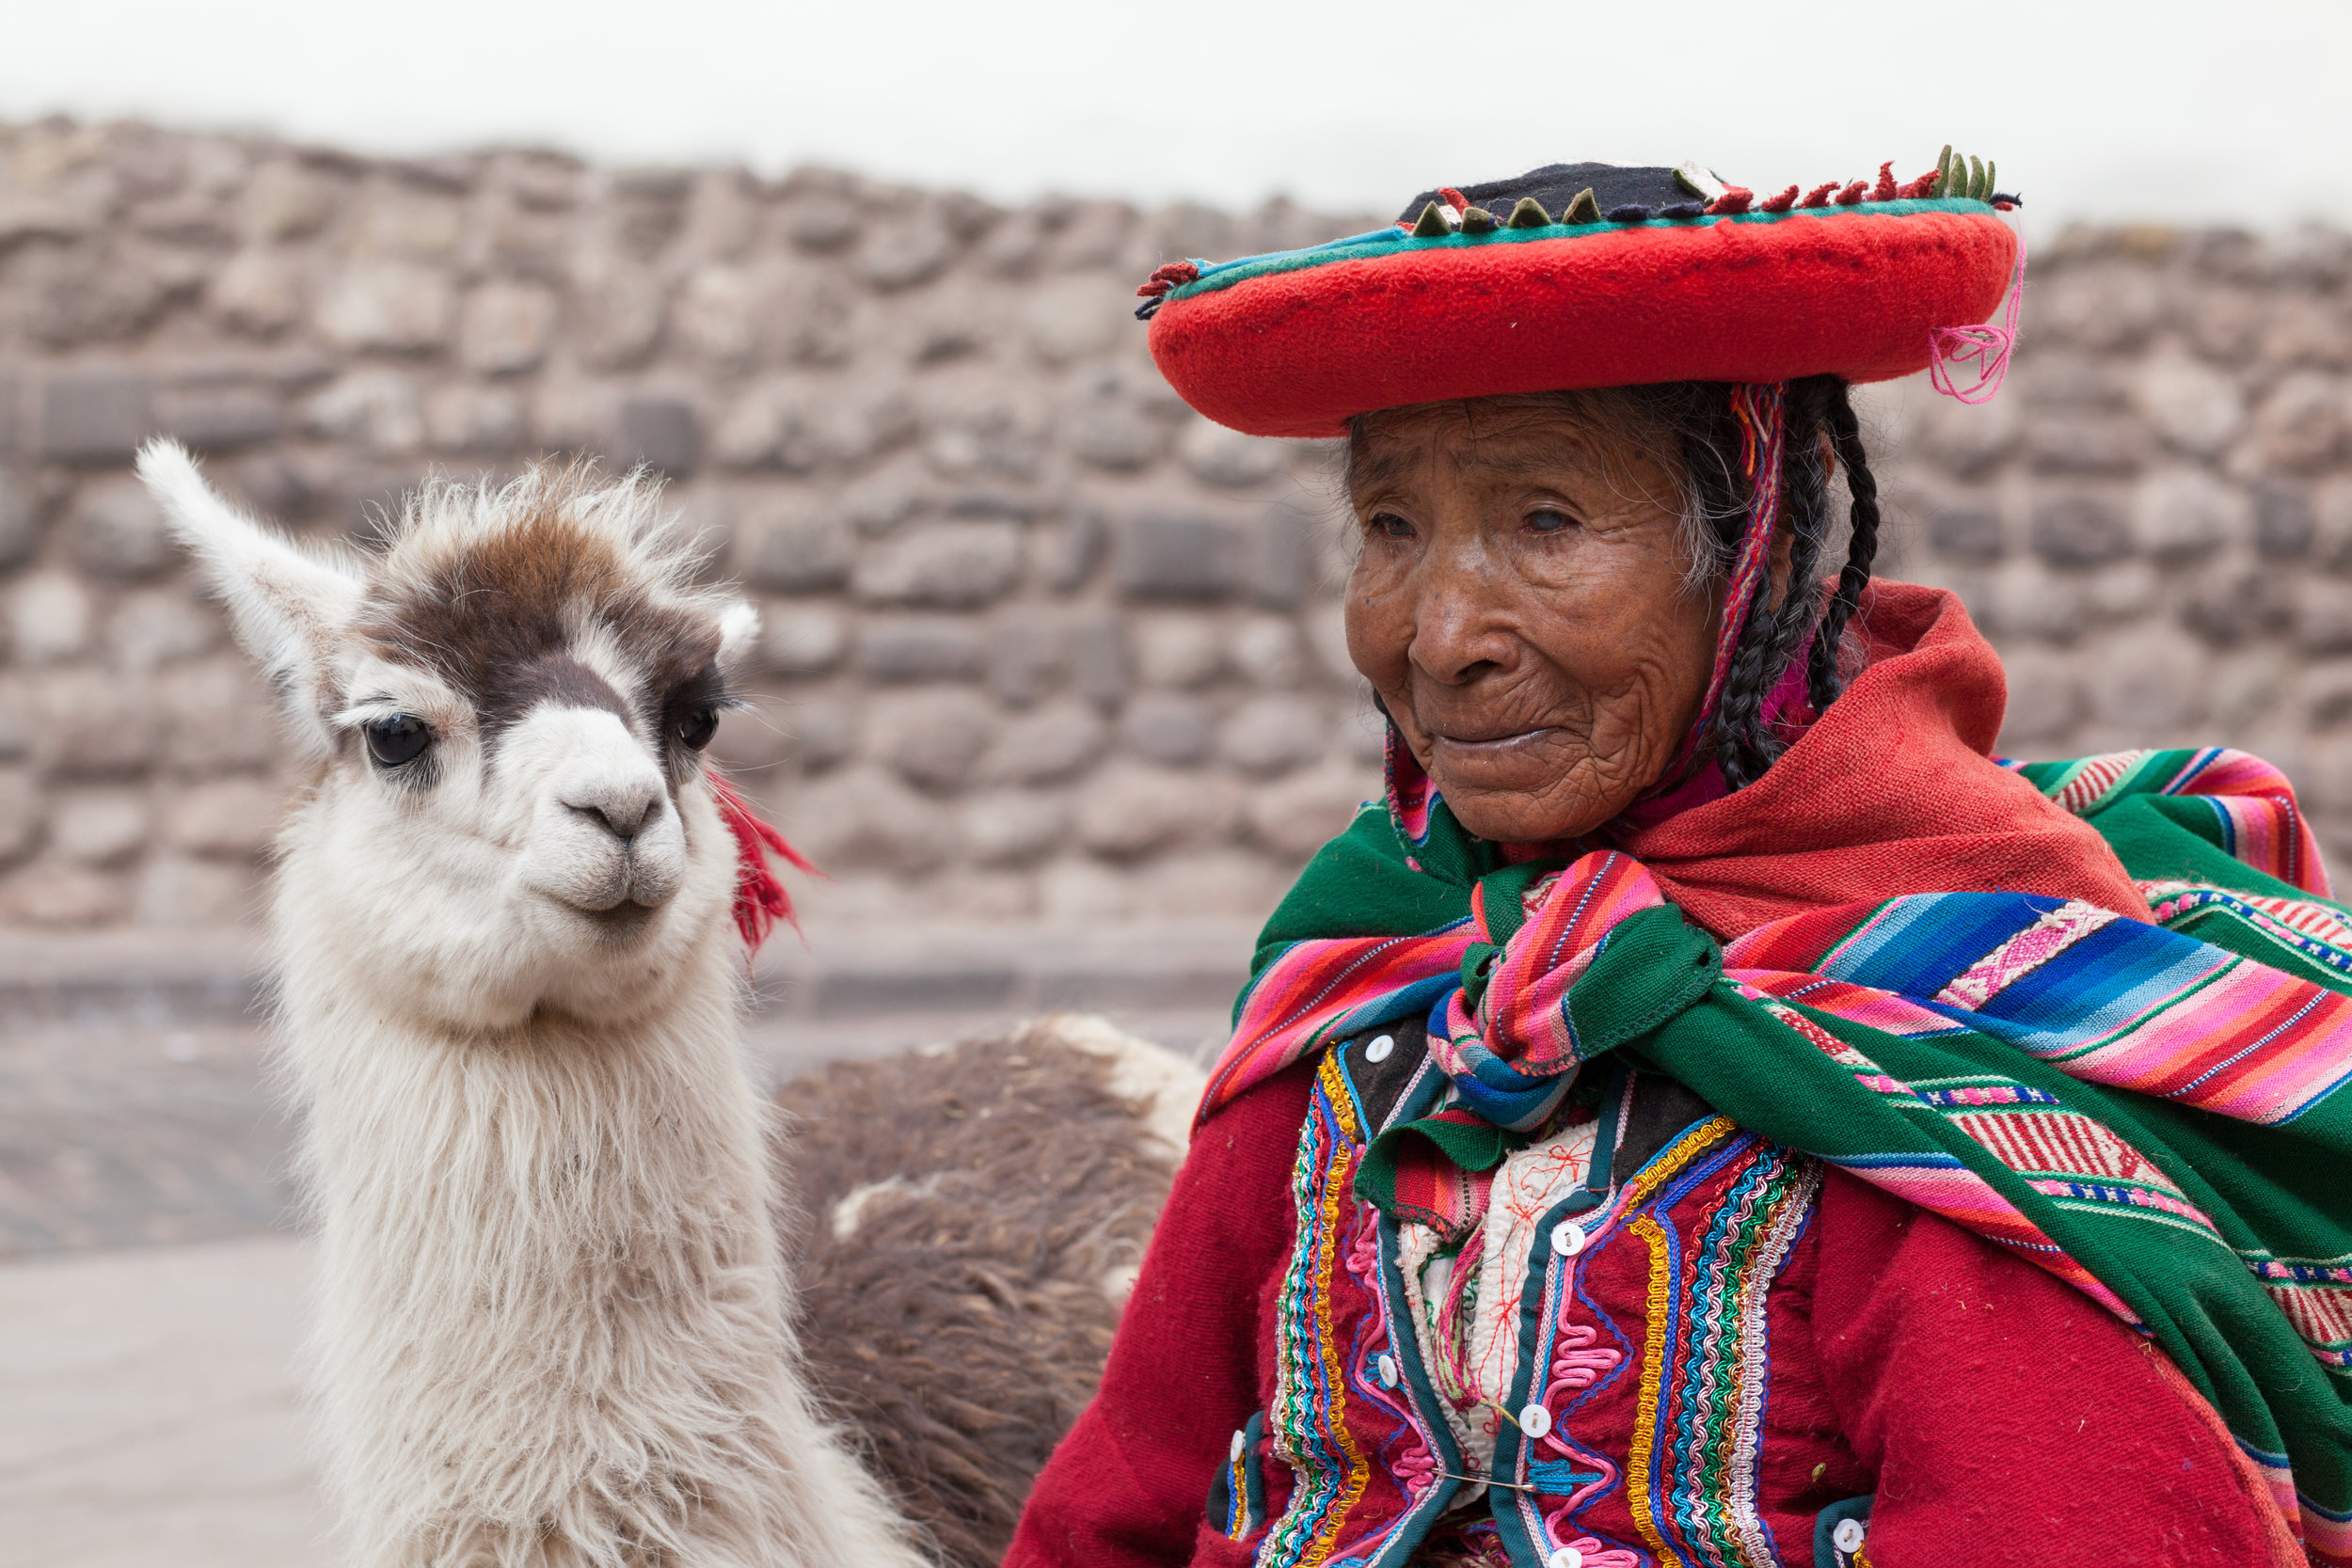 Peruvian Portrait by Geraint Rowland, Cusco.